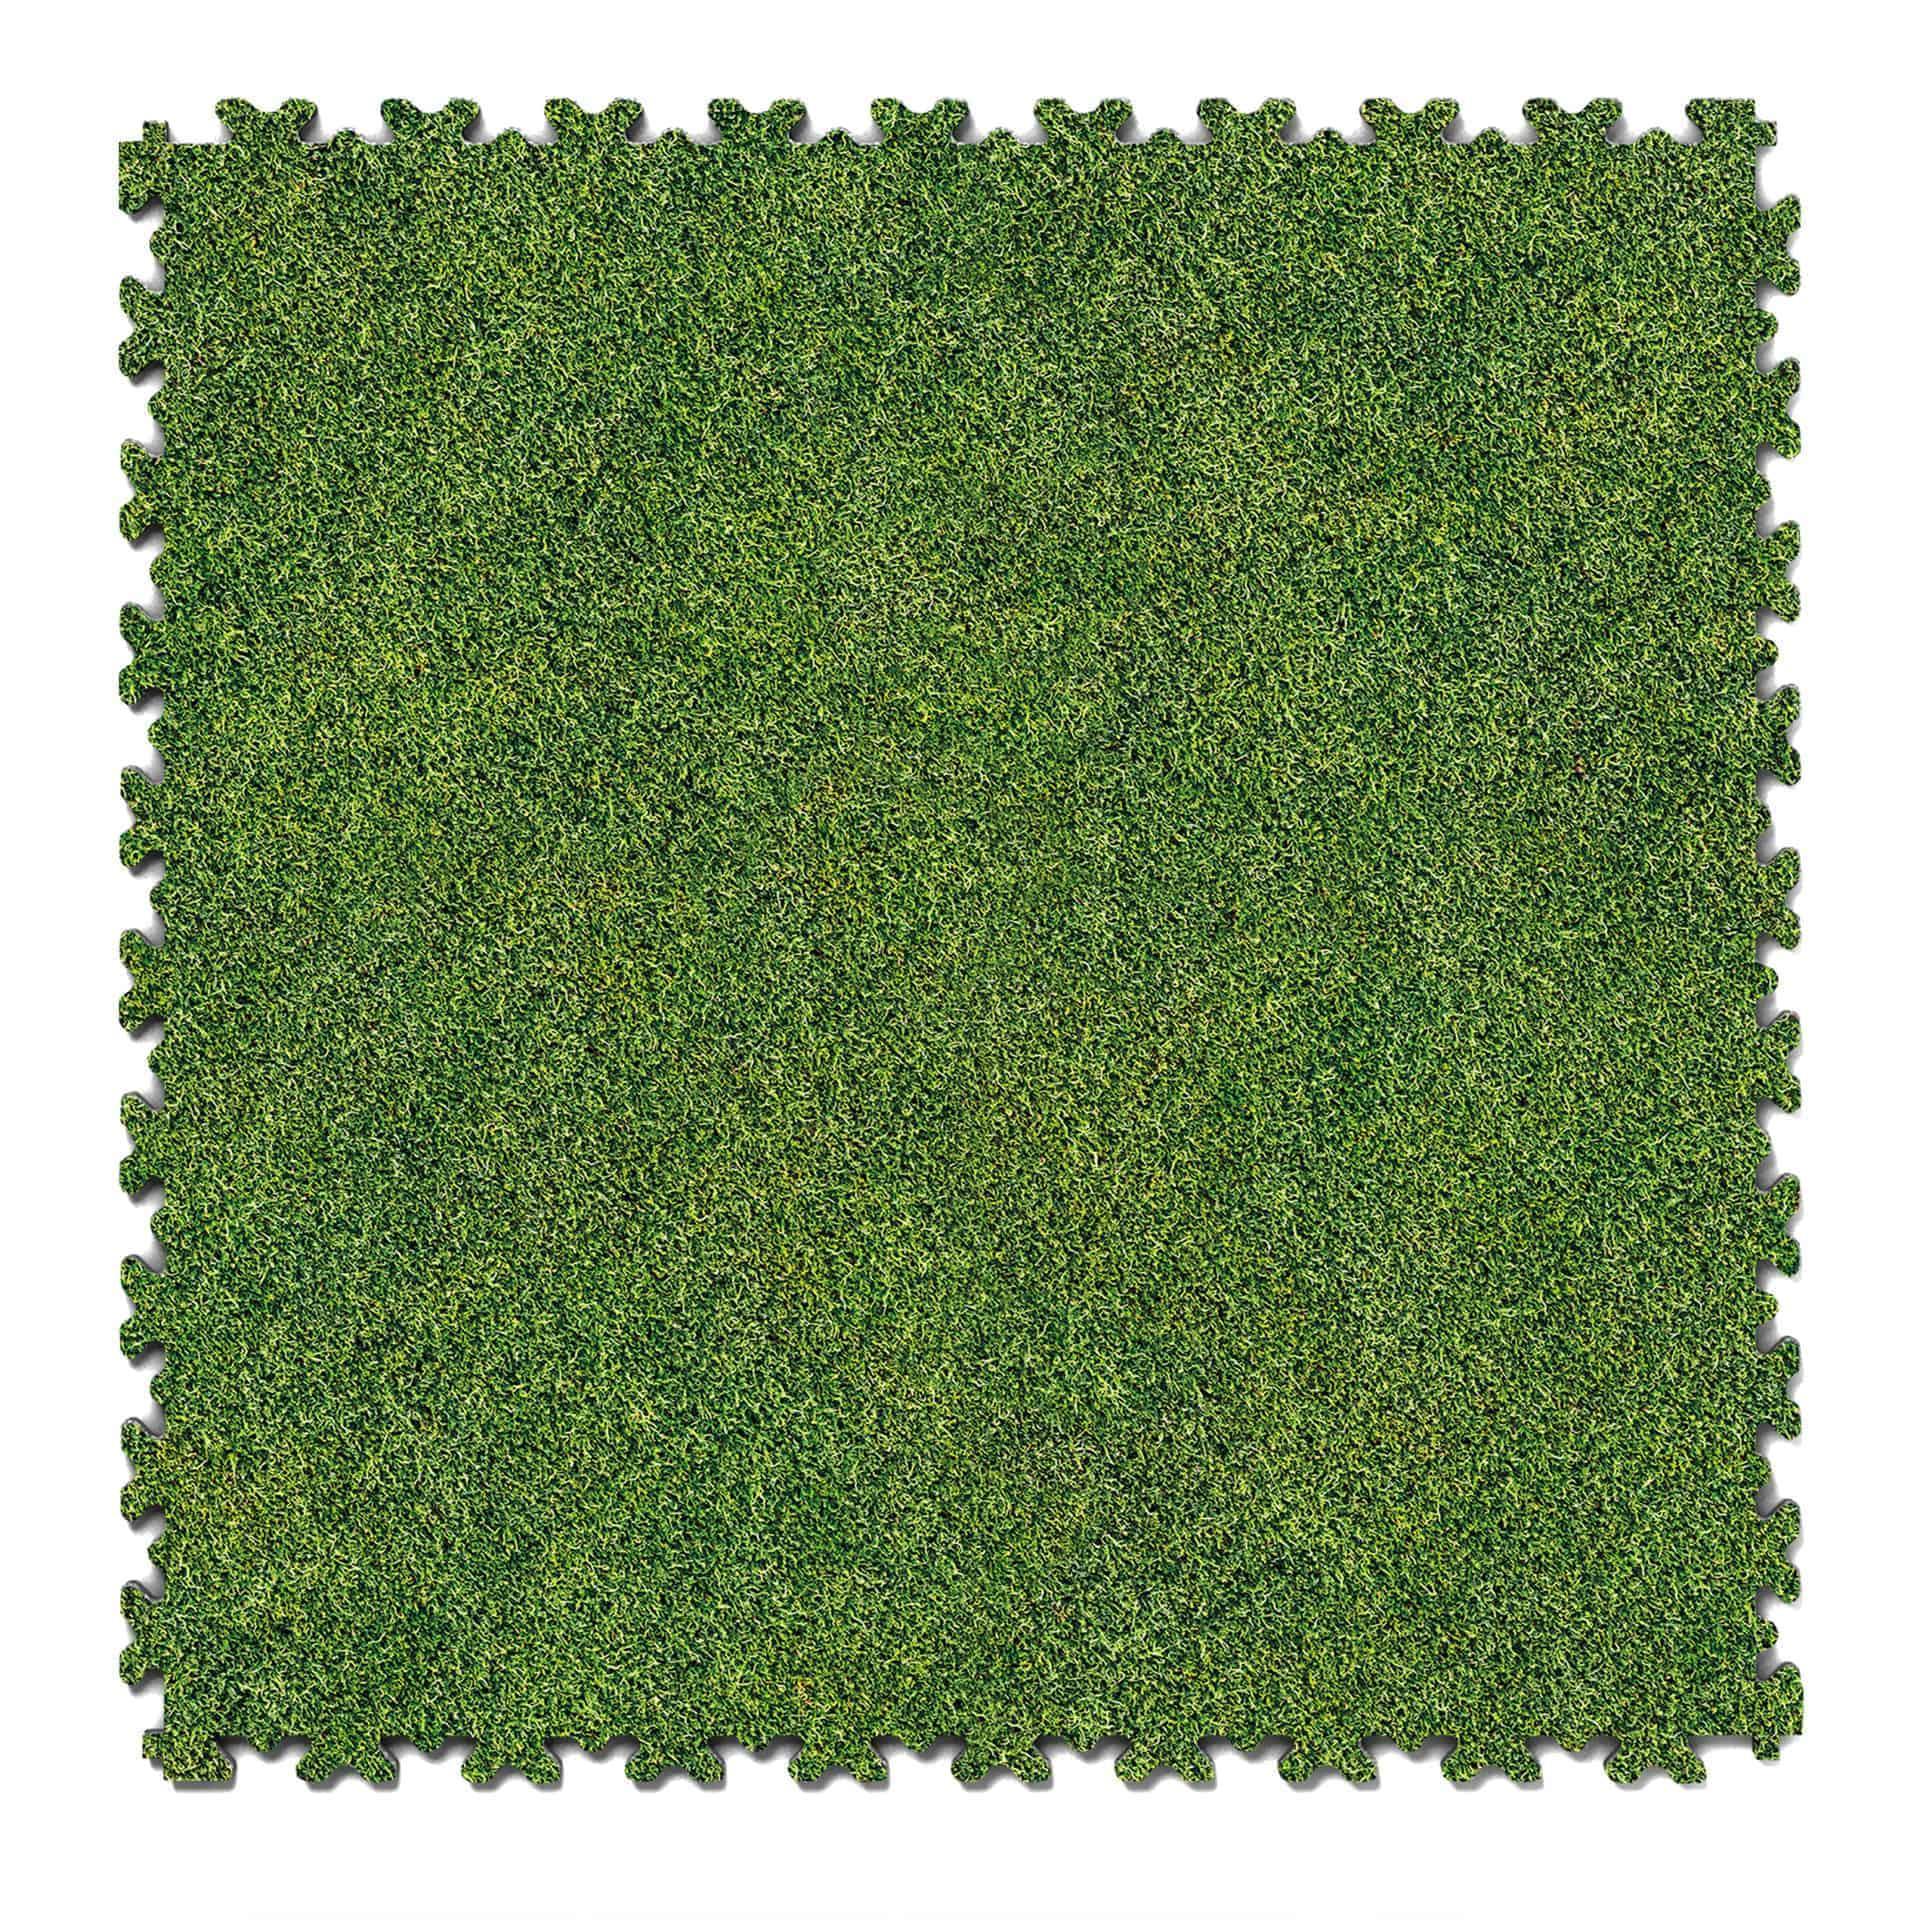 Impression Grass